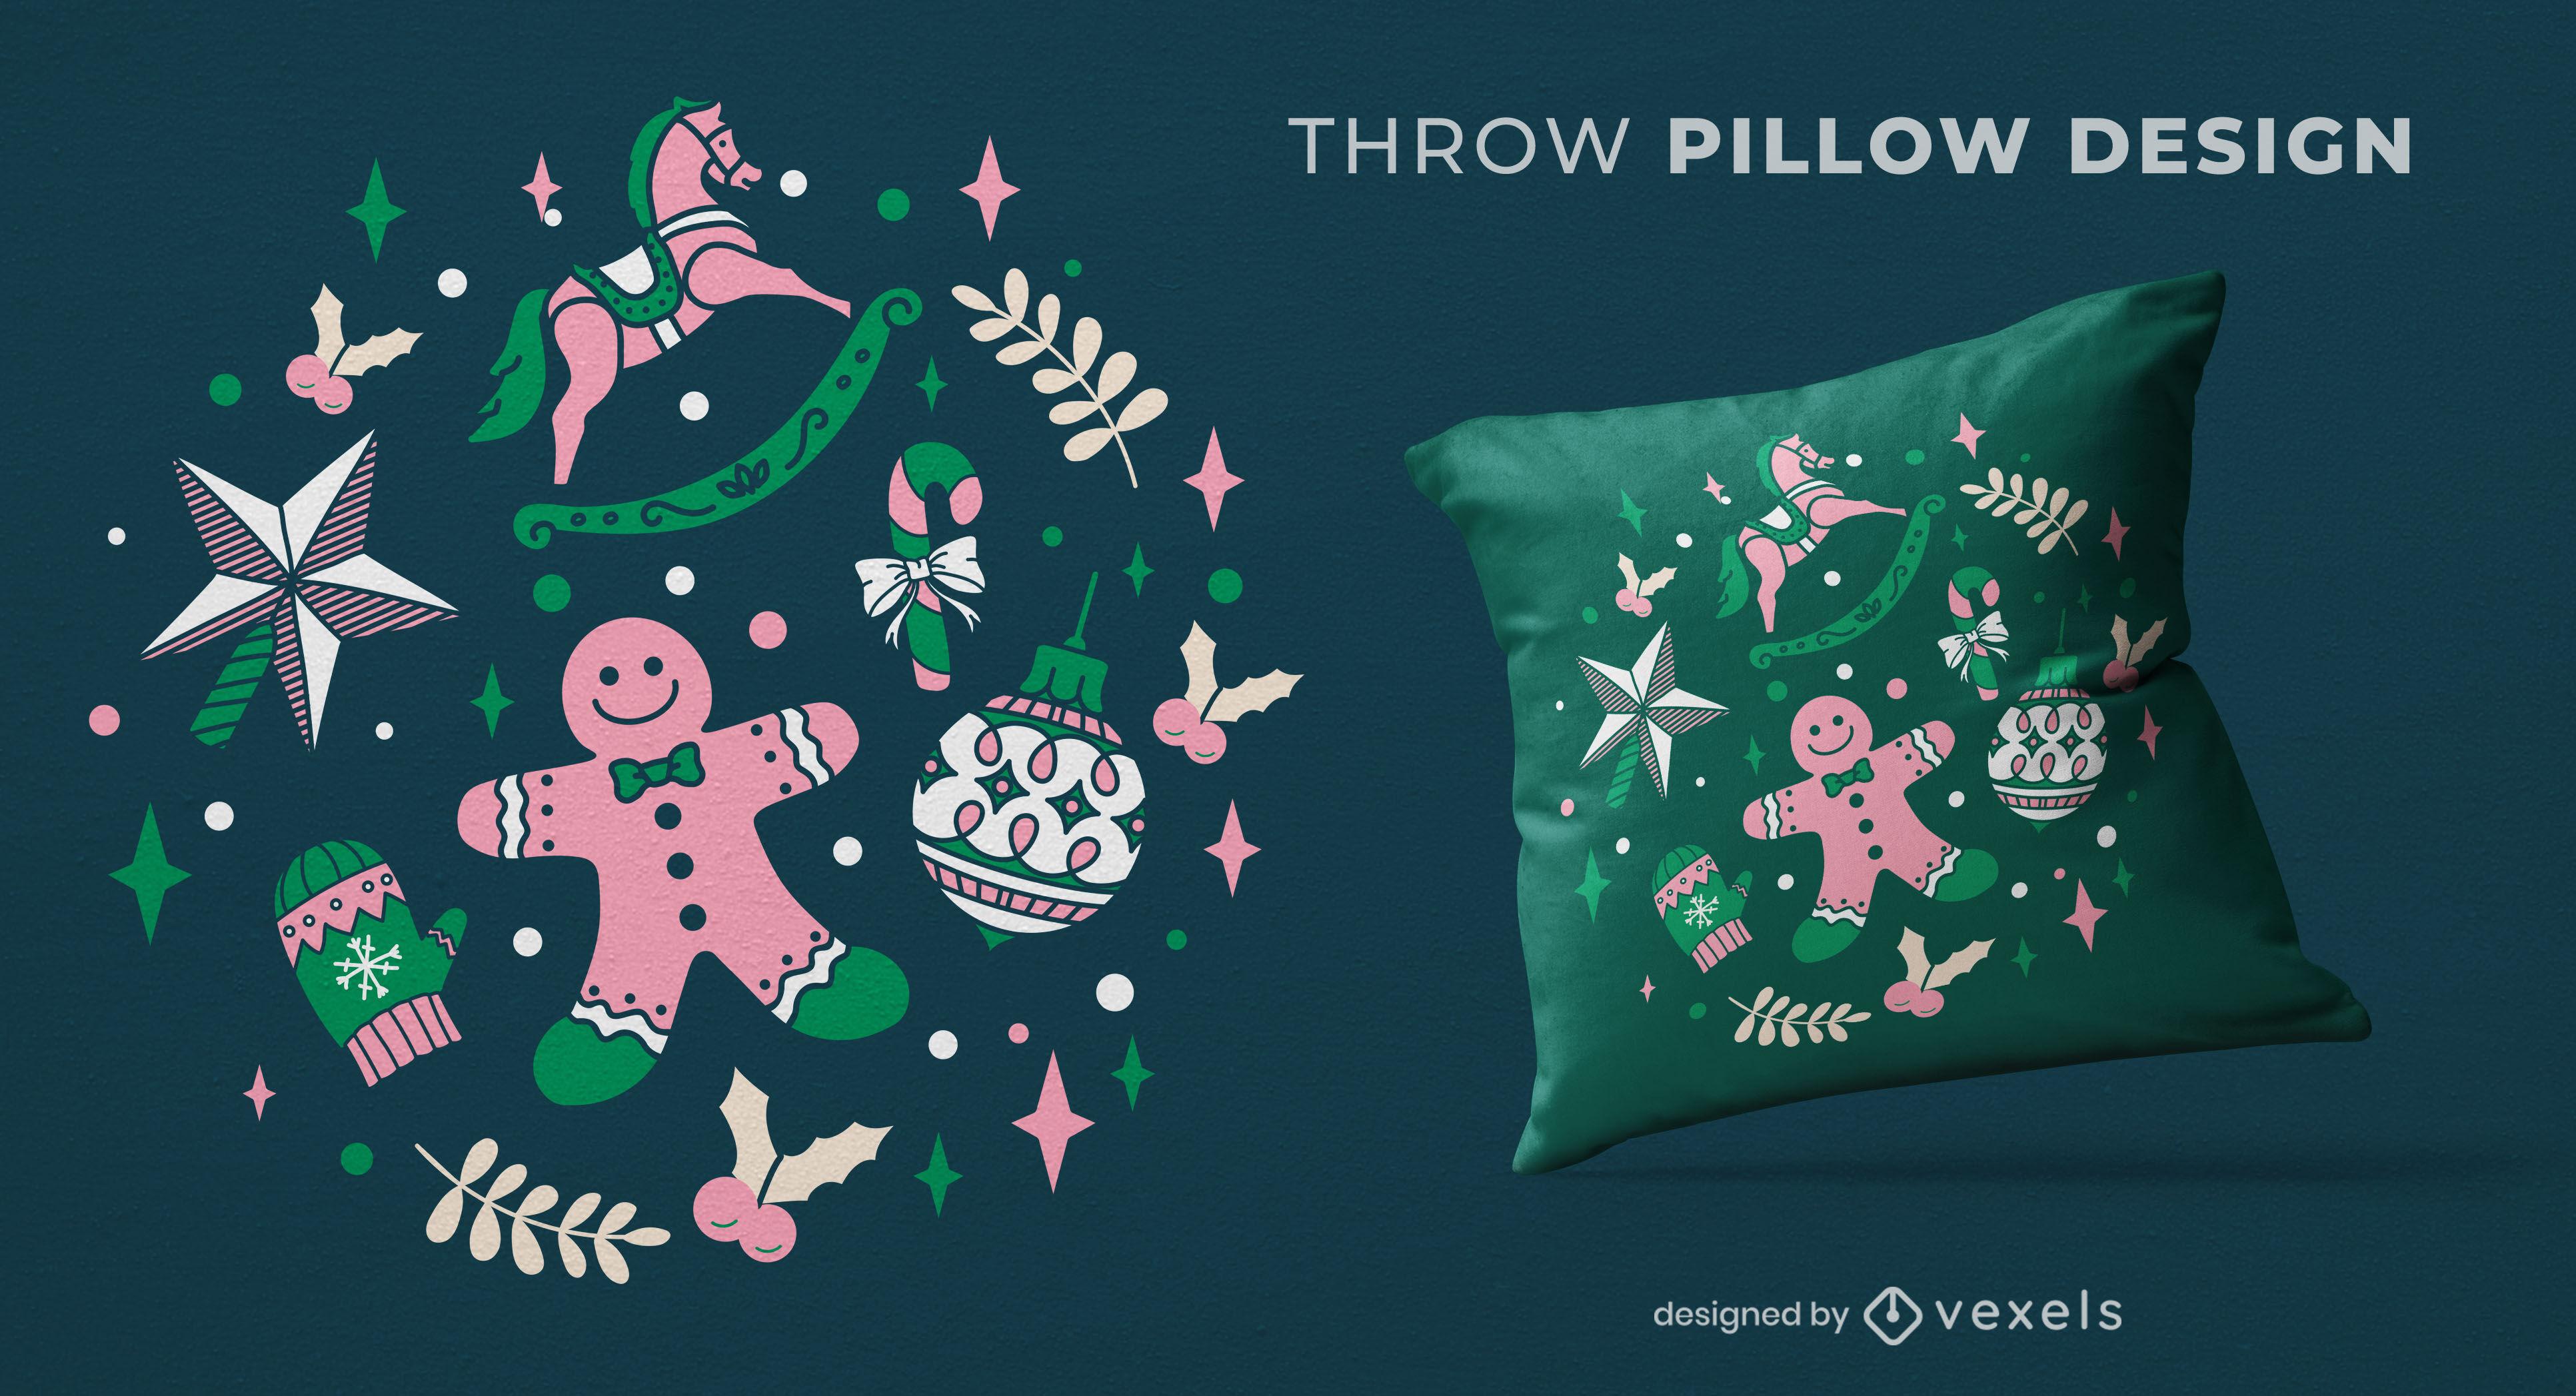 Christmas decorations throw pillow design